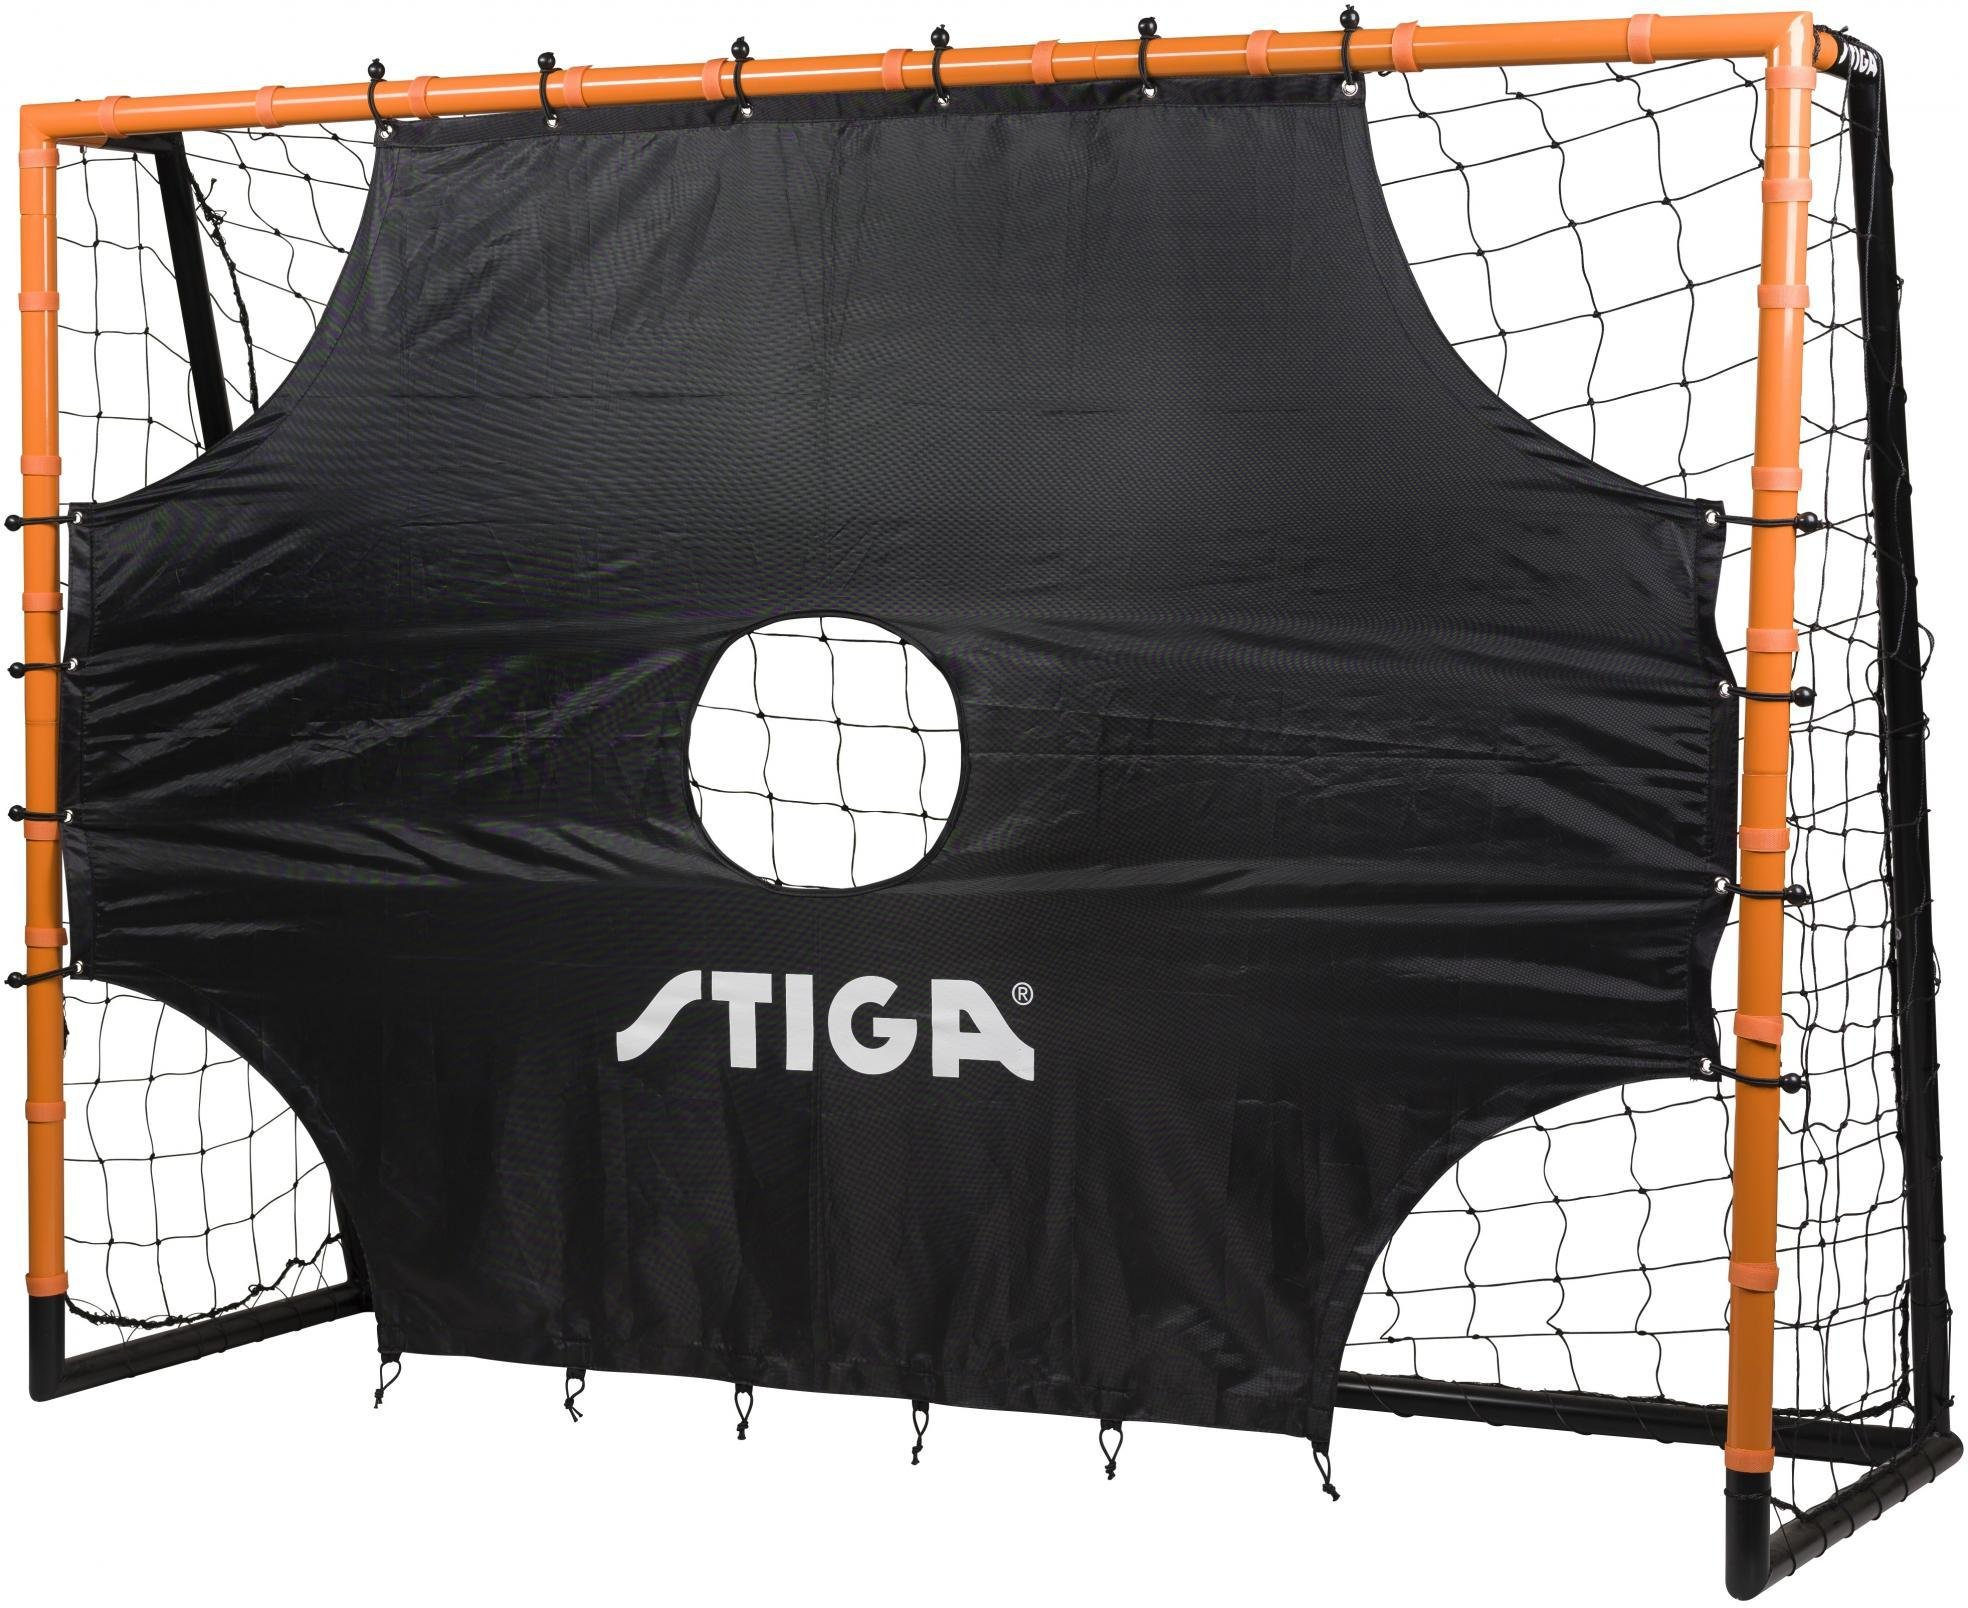 Fotbalová plachta Stiga Target Scorer